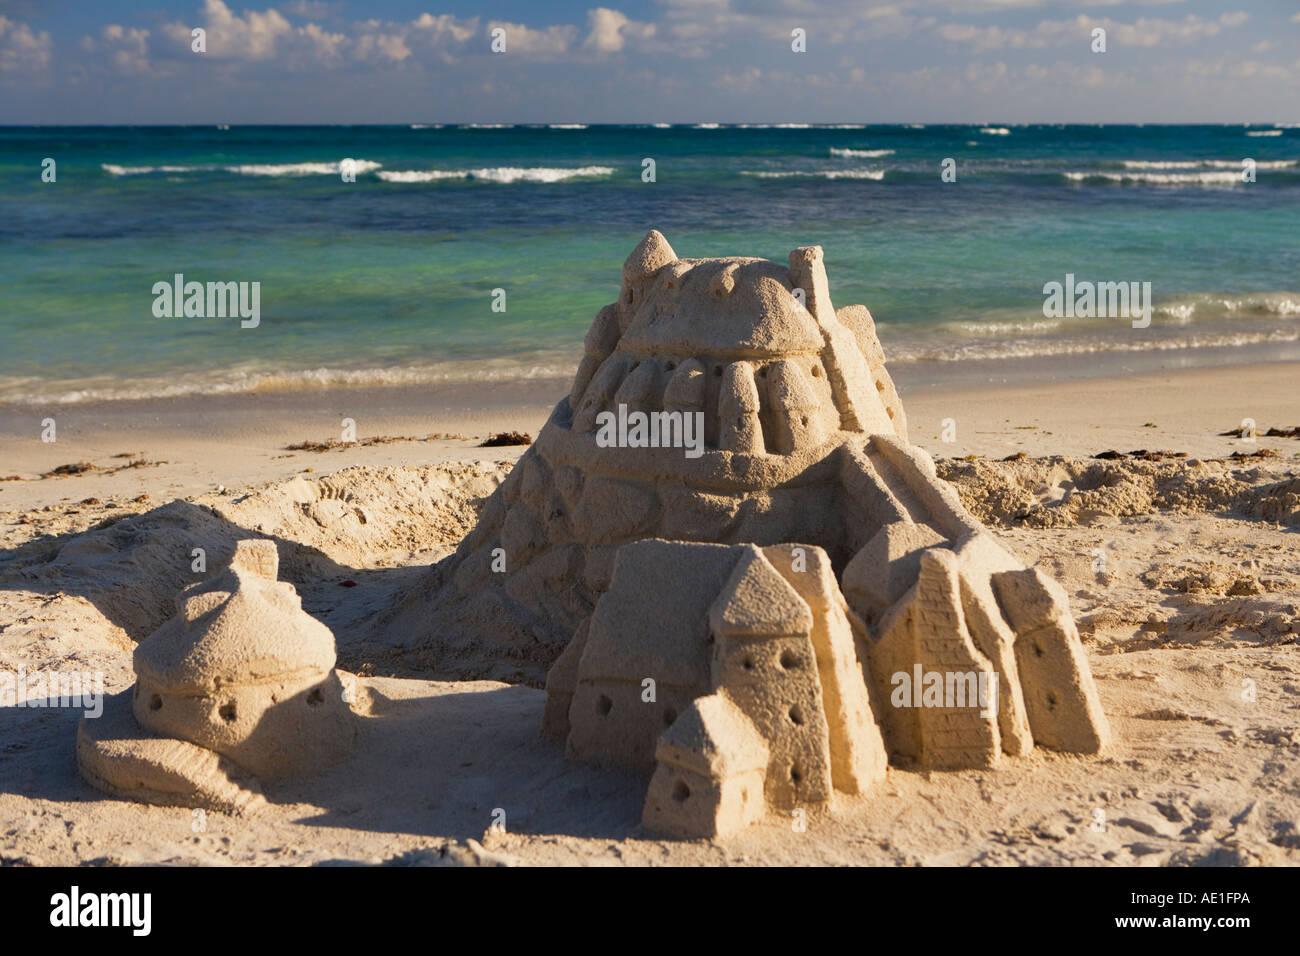 Sand Castle on the beach at Dreams Tulum Resort, Tulum, Quintana Roo, Mexico, Riviera Maya - Stock Image